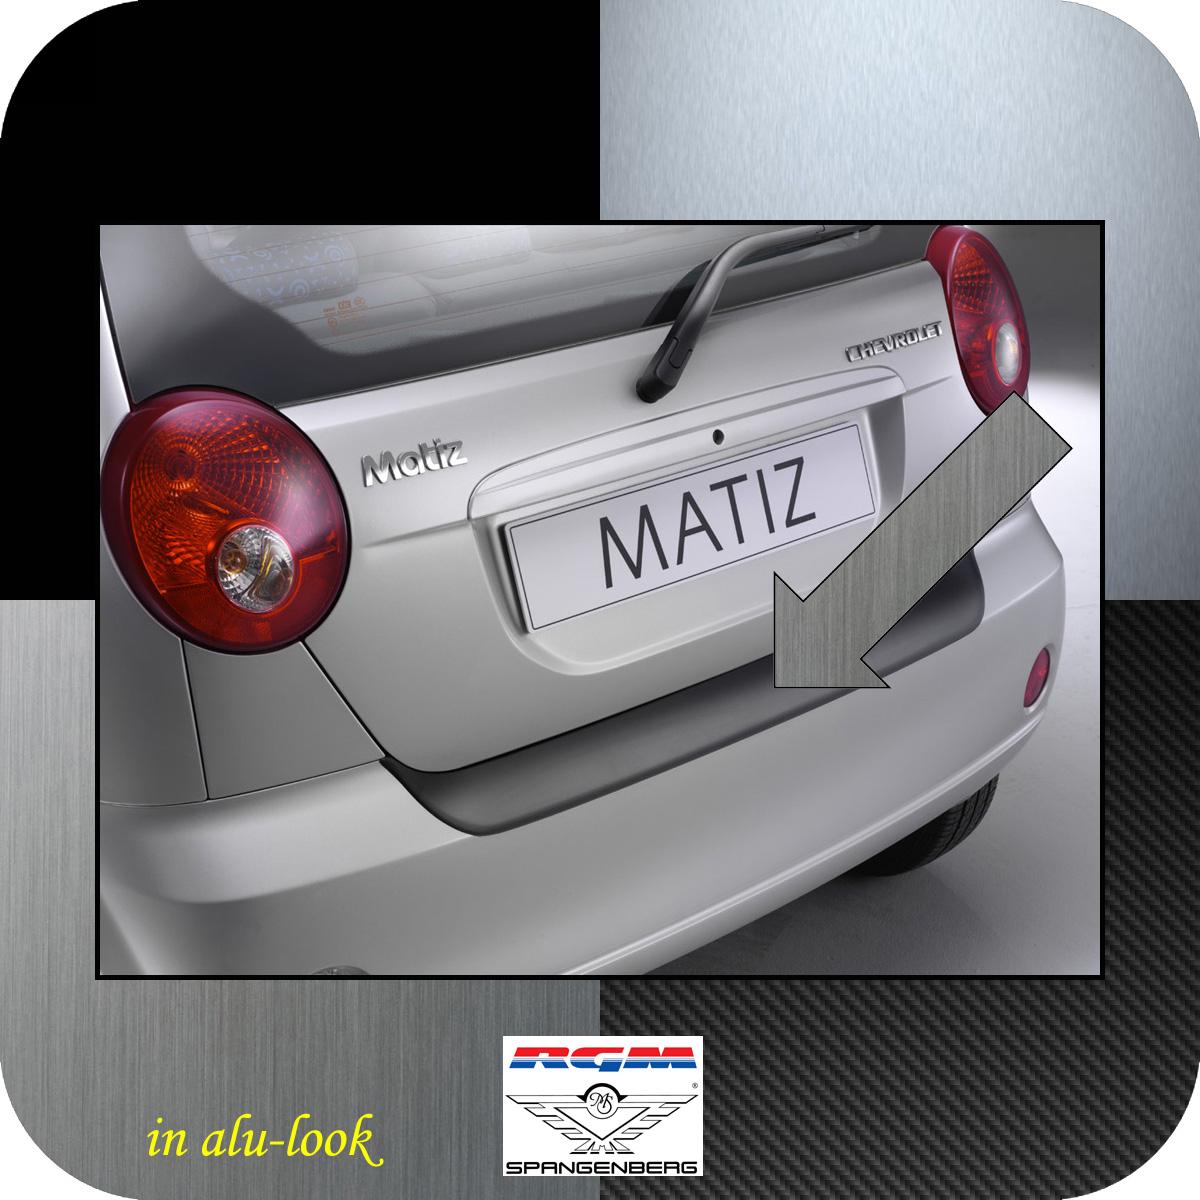 Ladekantenschutz Alu-Look Chevrolet Matiz Spark Schrägheck bis 2010 3504326